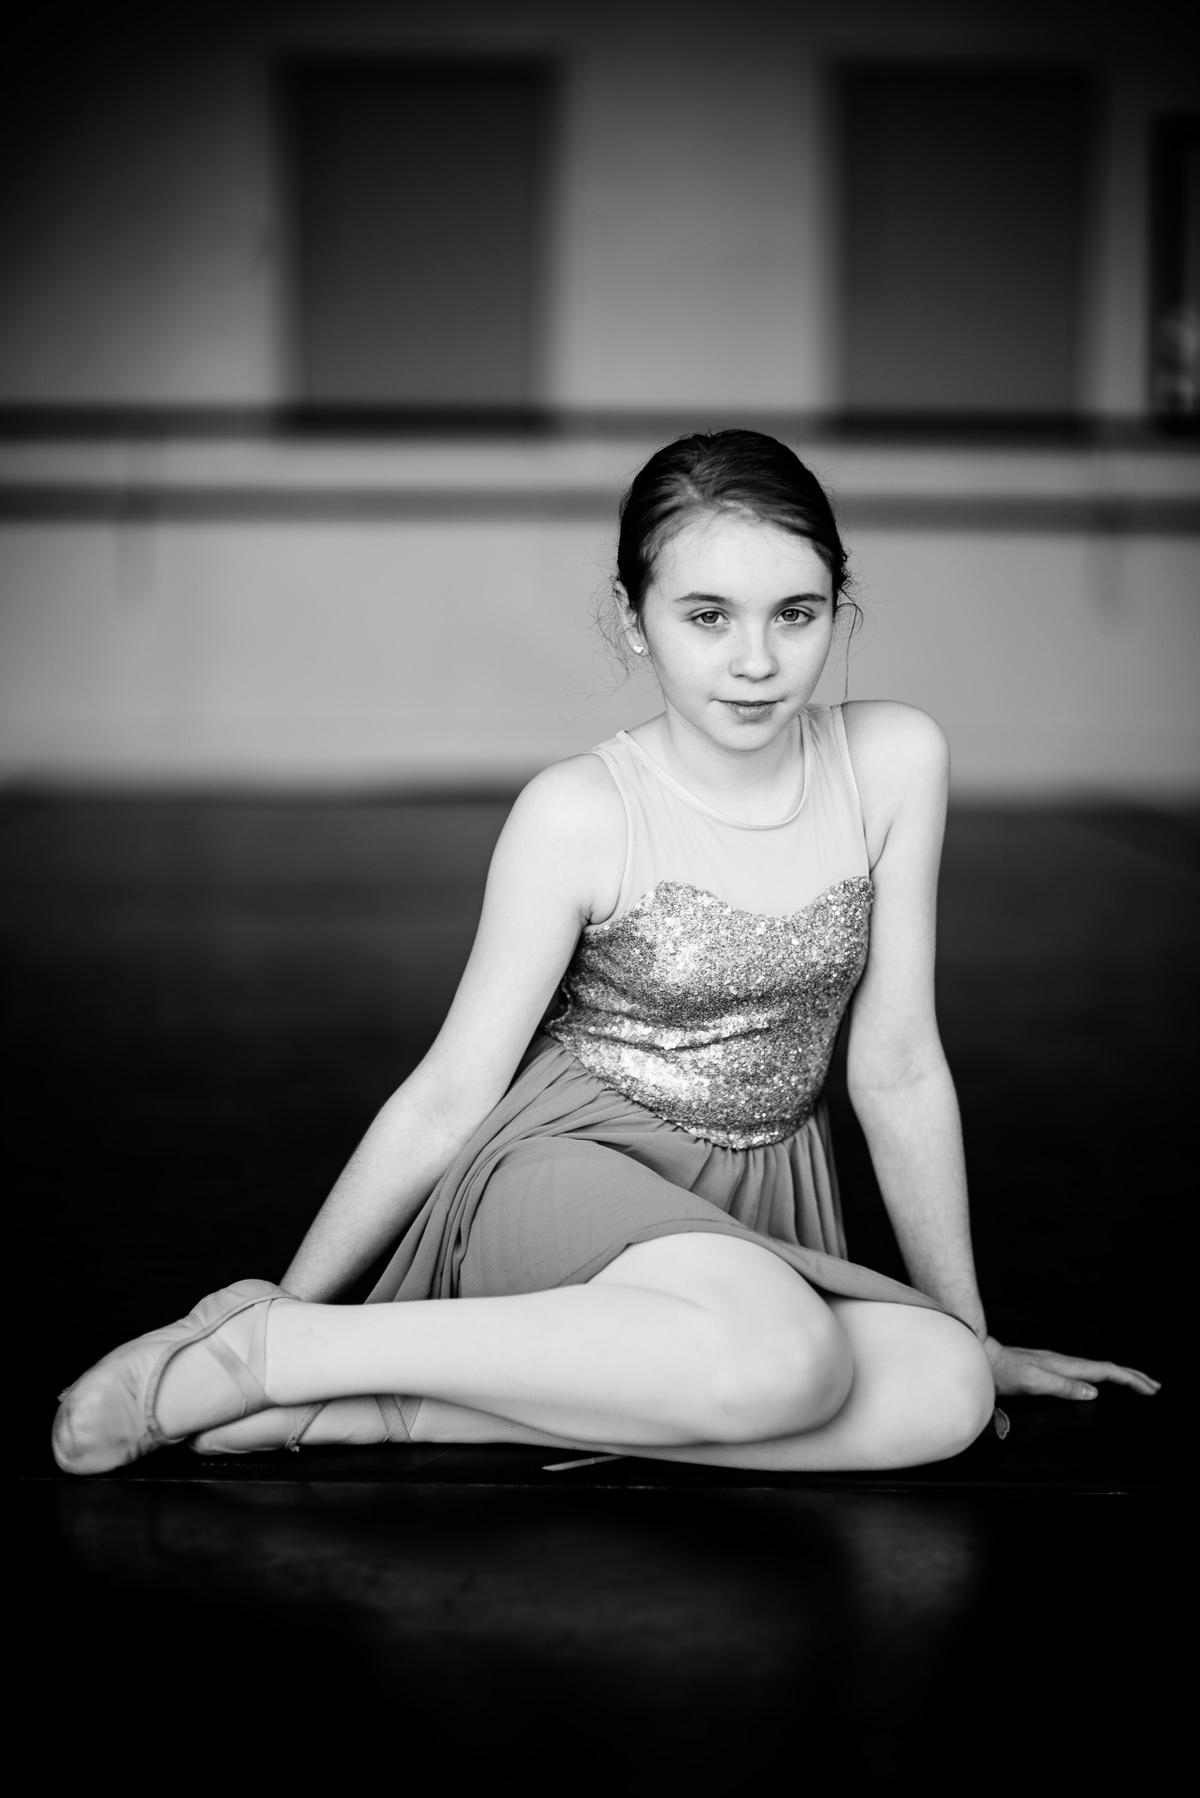 dancer photo portraits 1